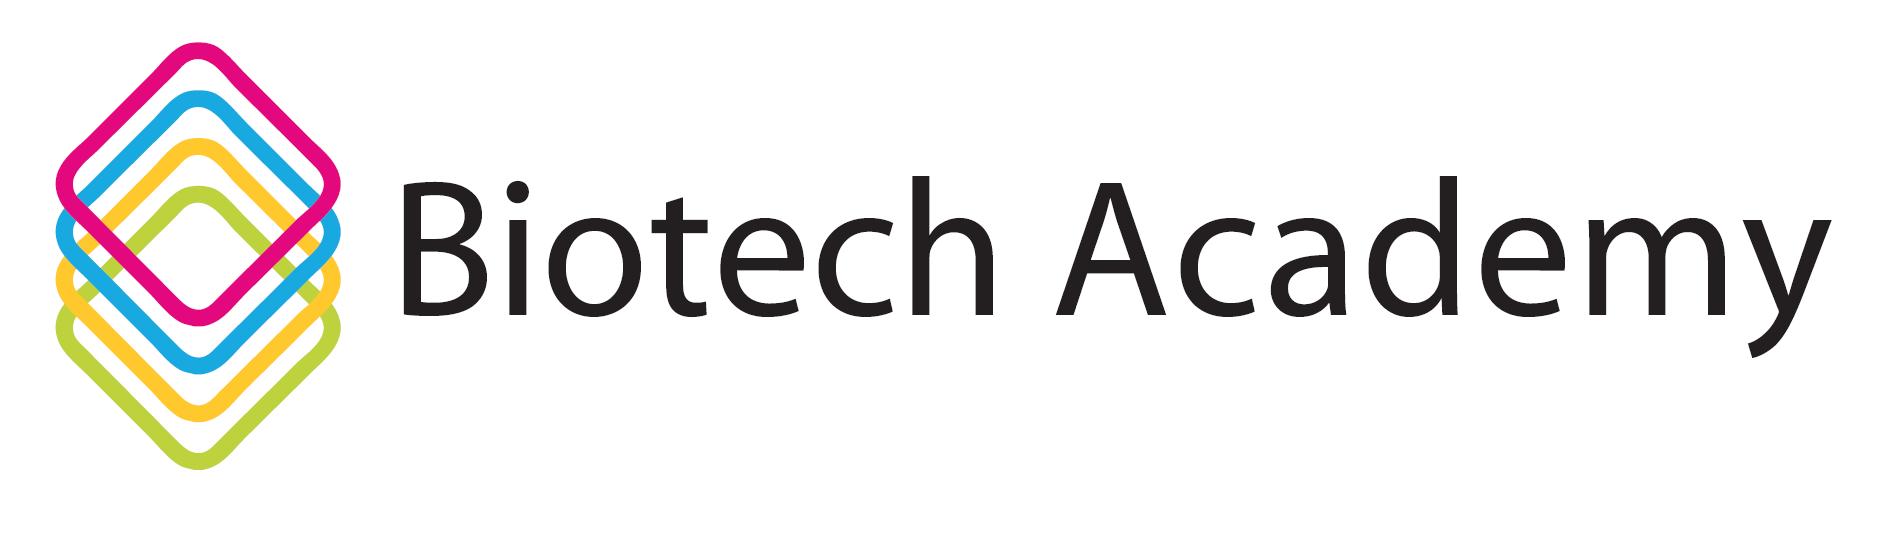 Biotech Academy